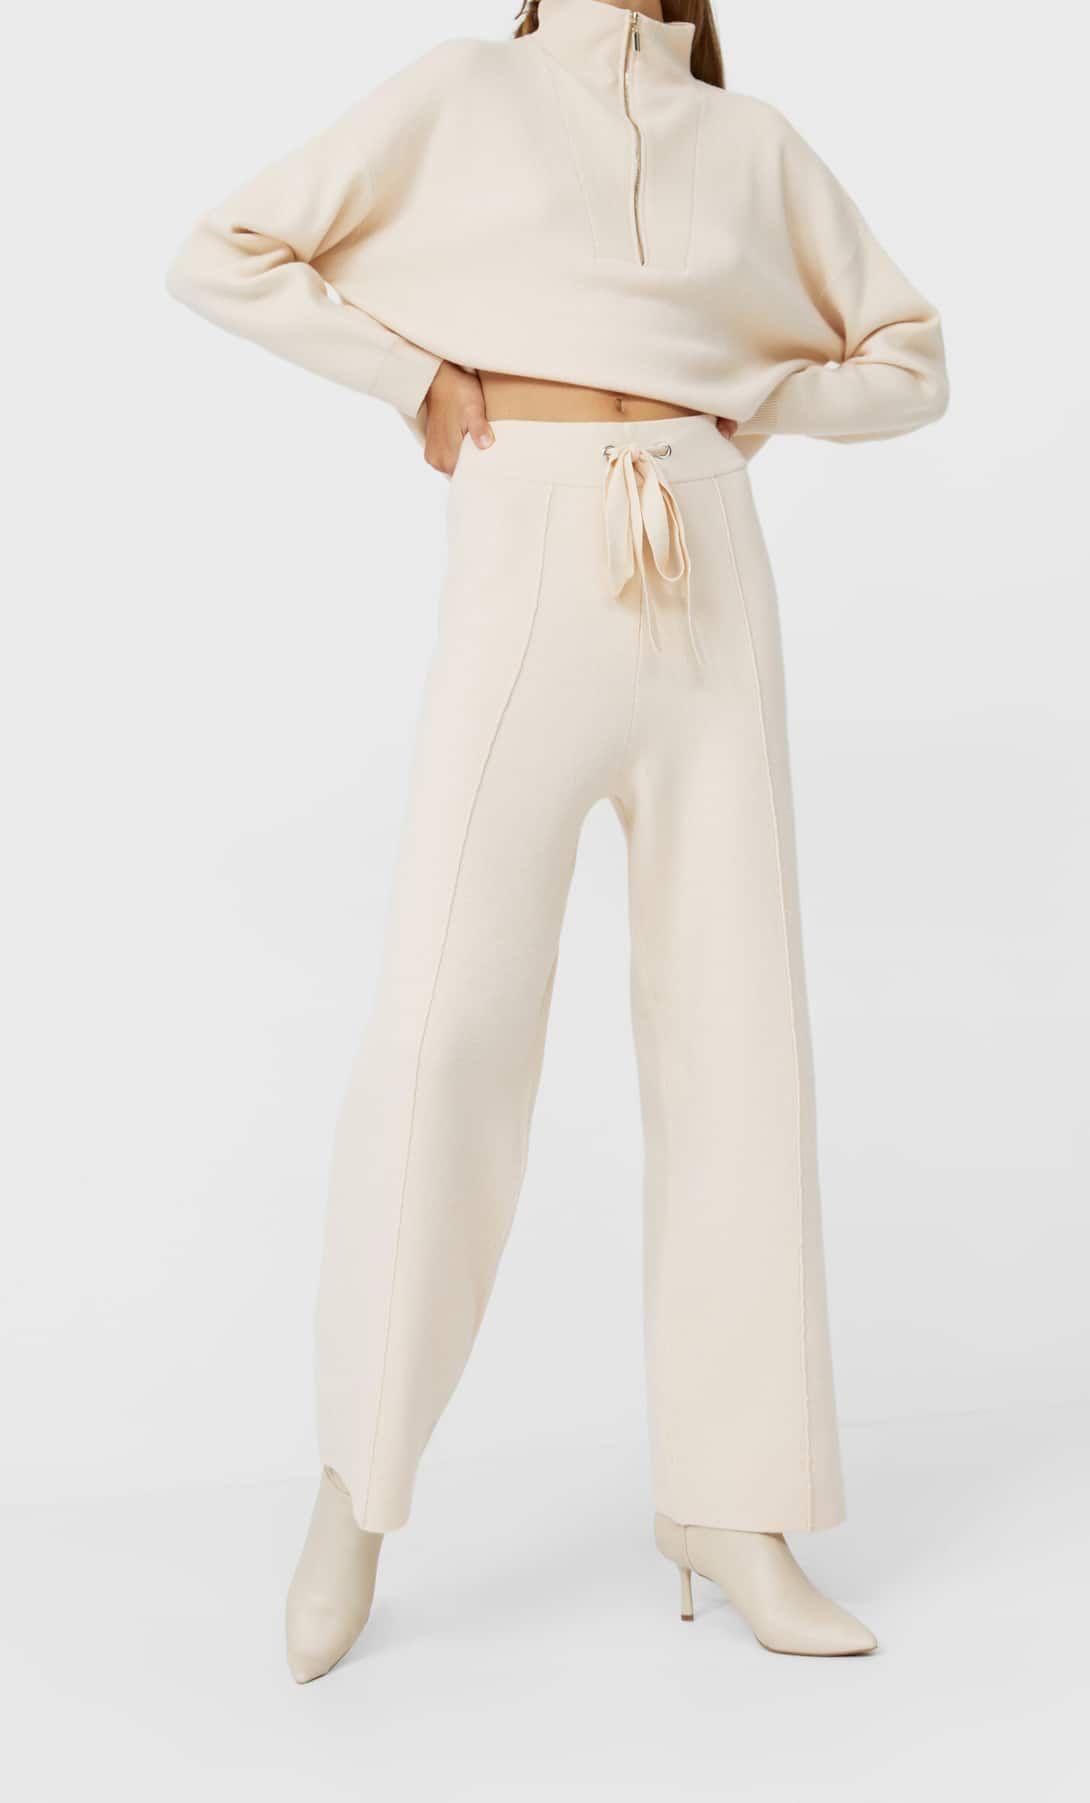 El Pantalon De Punto Blanco De Stradivarius Que Sienta Genial